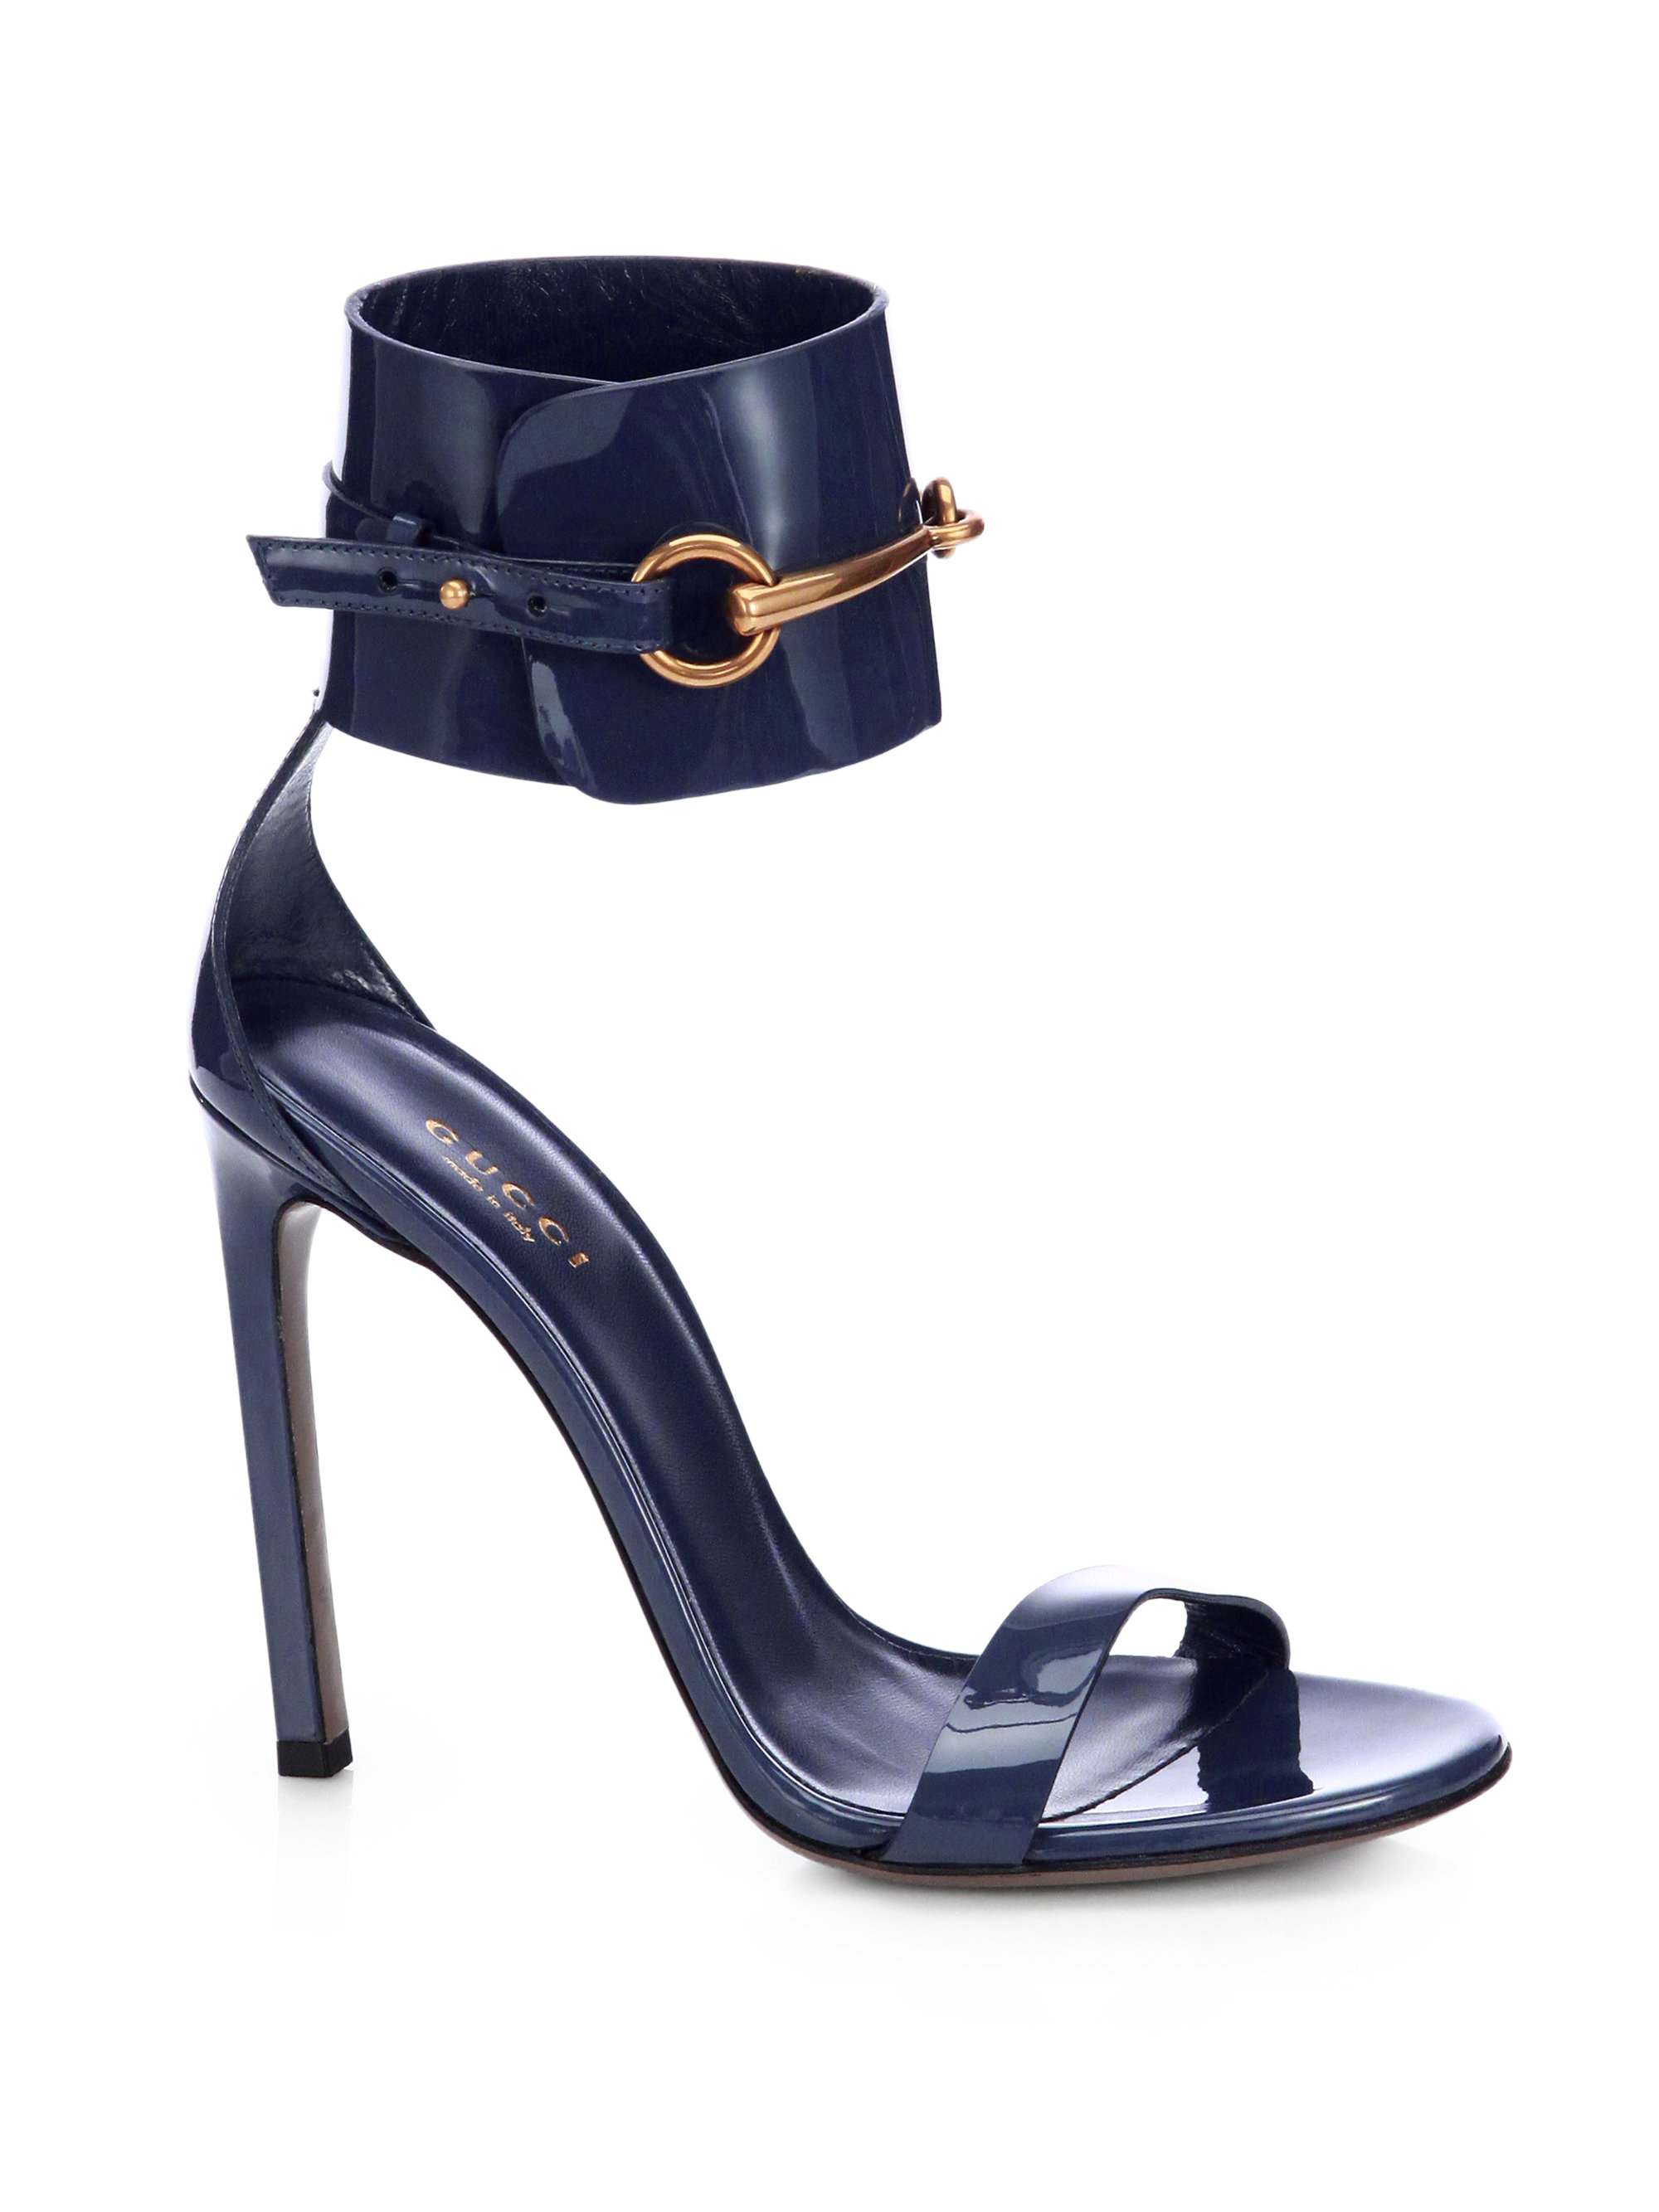 5d2c043c6 Gucci Ursula Patent Leather Horsebit Ankle-Strap Sandals in Blue - Lyst